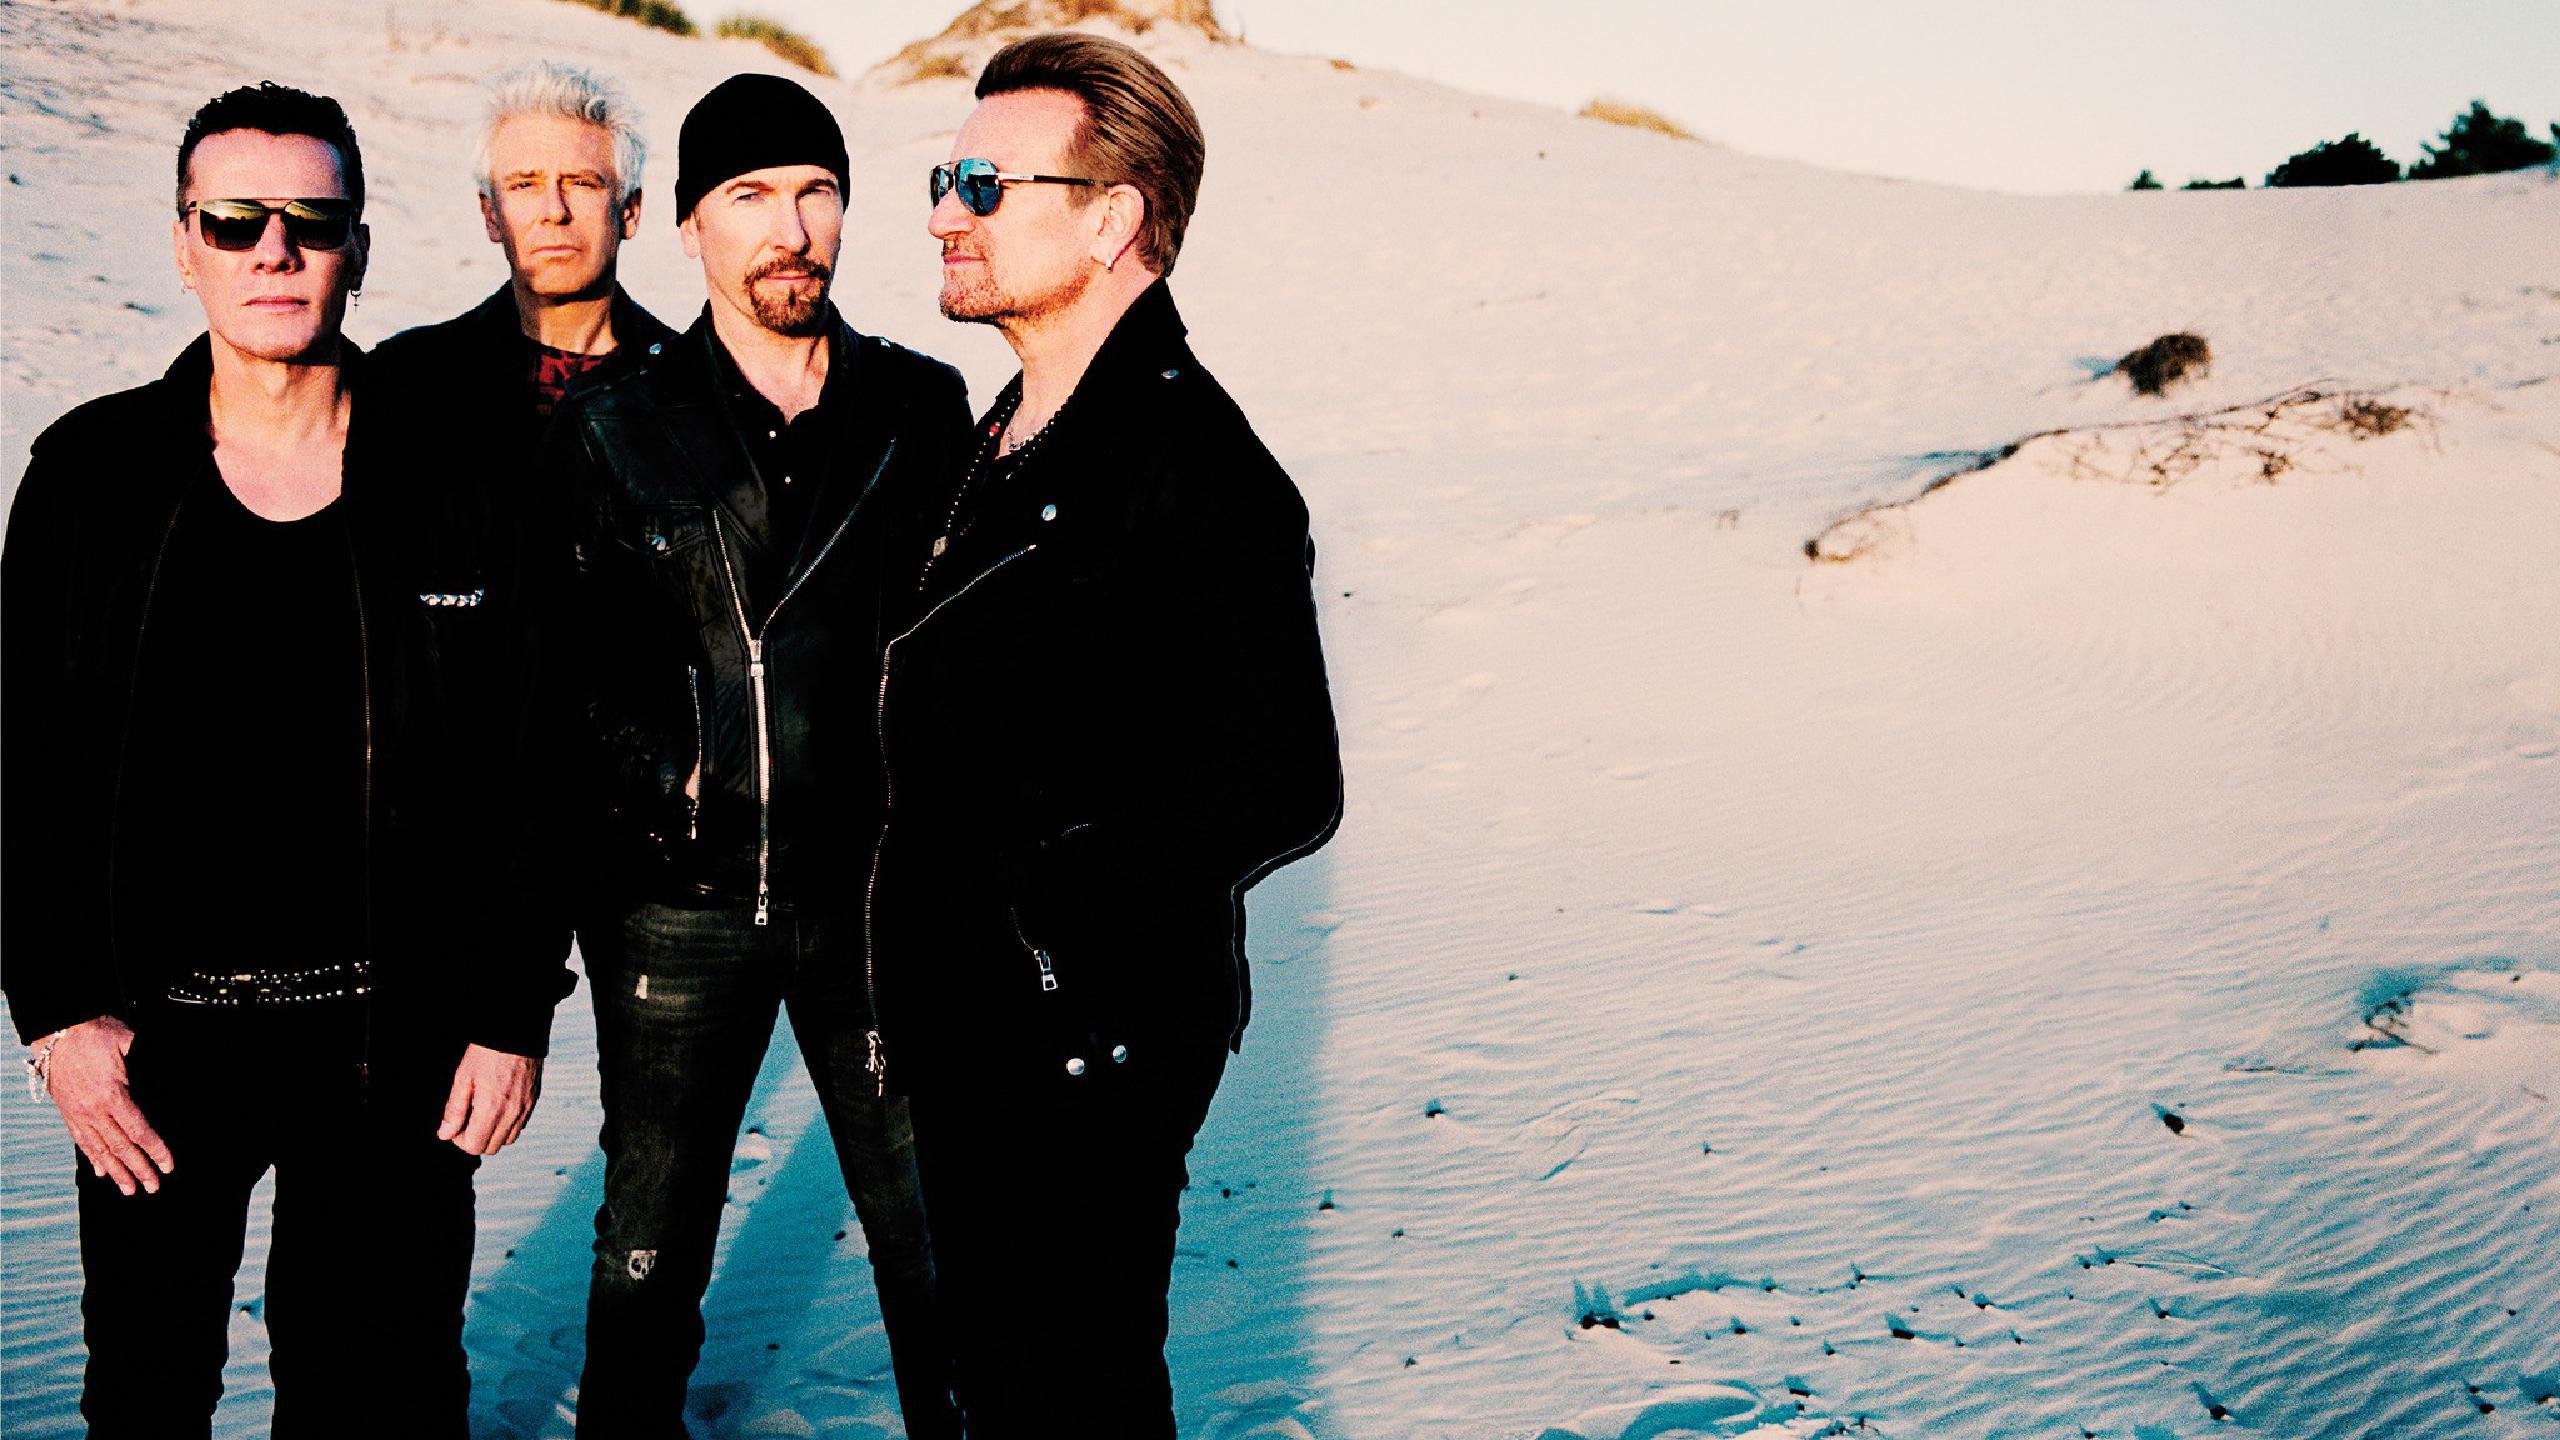 U2 Us Tour 2020 U2 tour dates 2019 2020. U2 tickets and concerts | Wegow United States